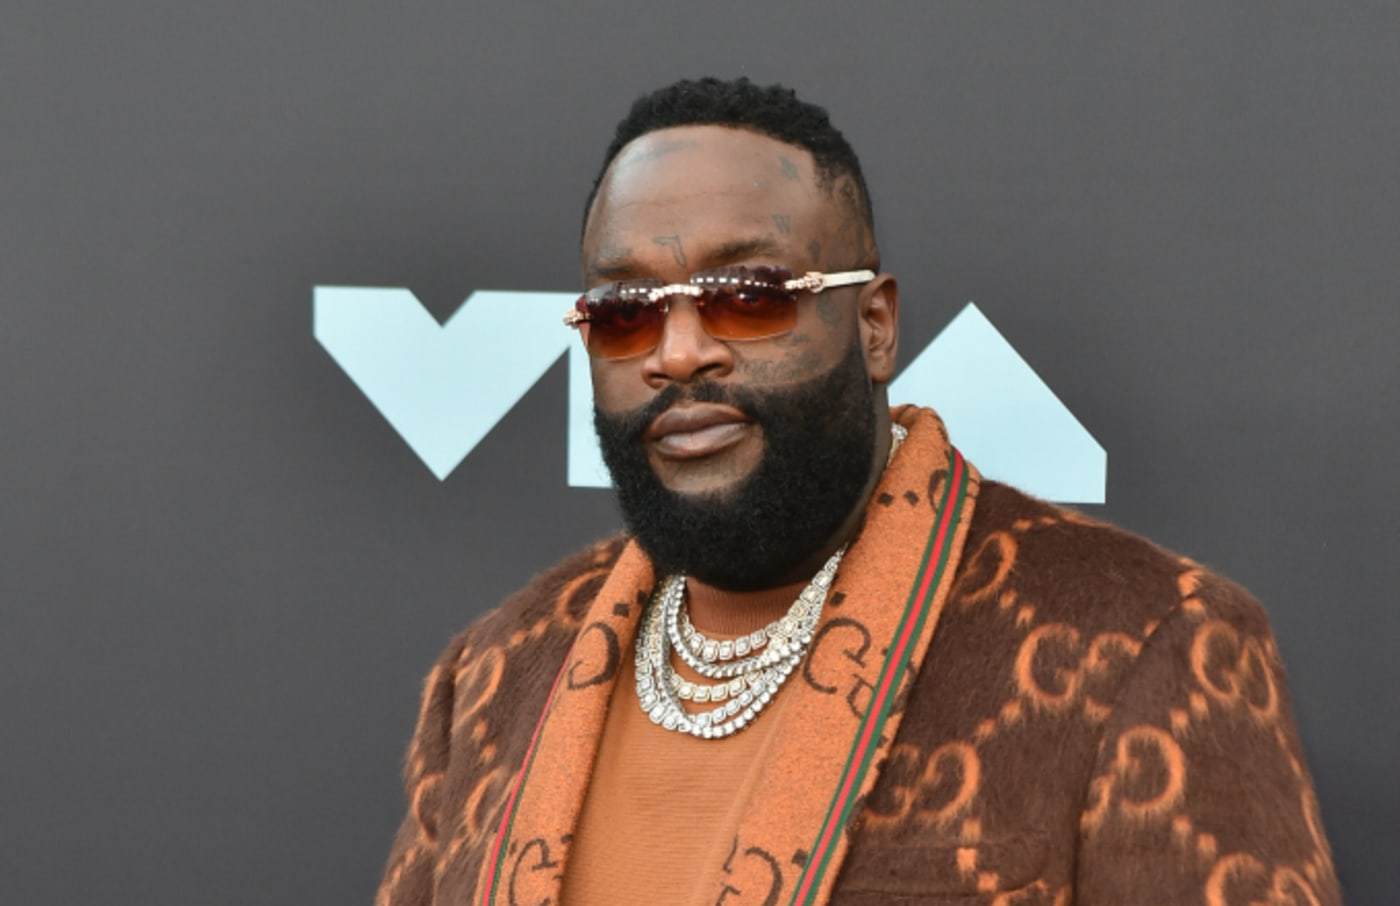 Rapper Rick Ross attends the 2019 MTV Video Music Awards